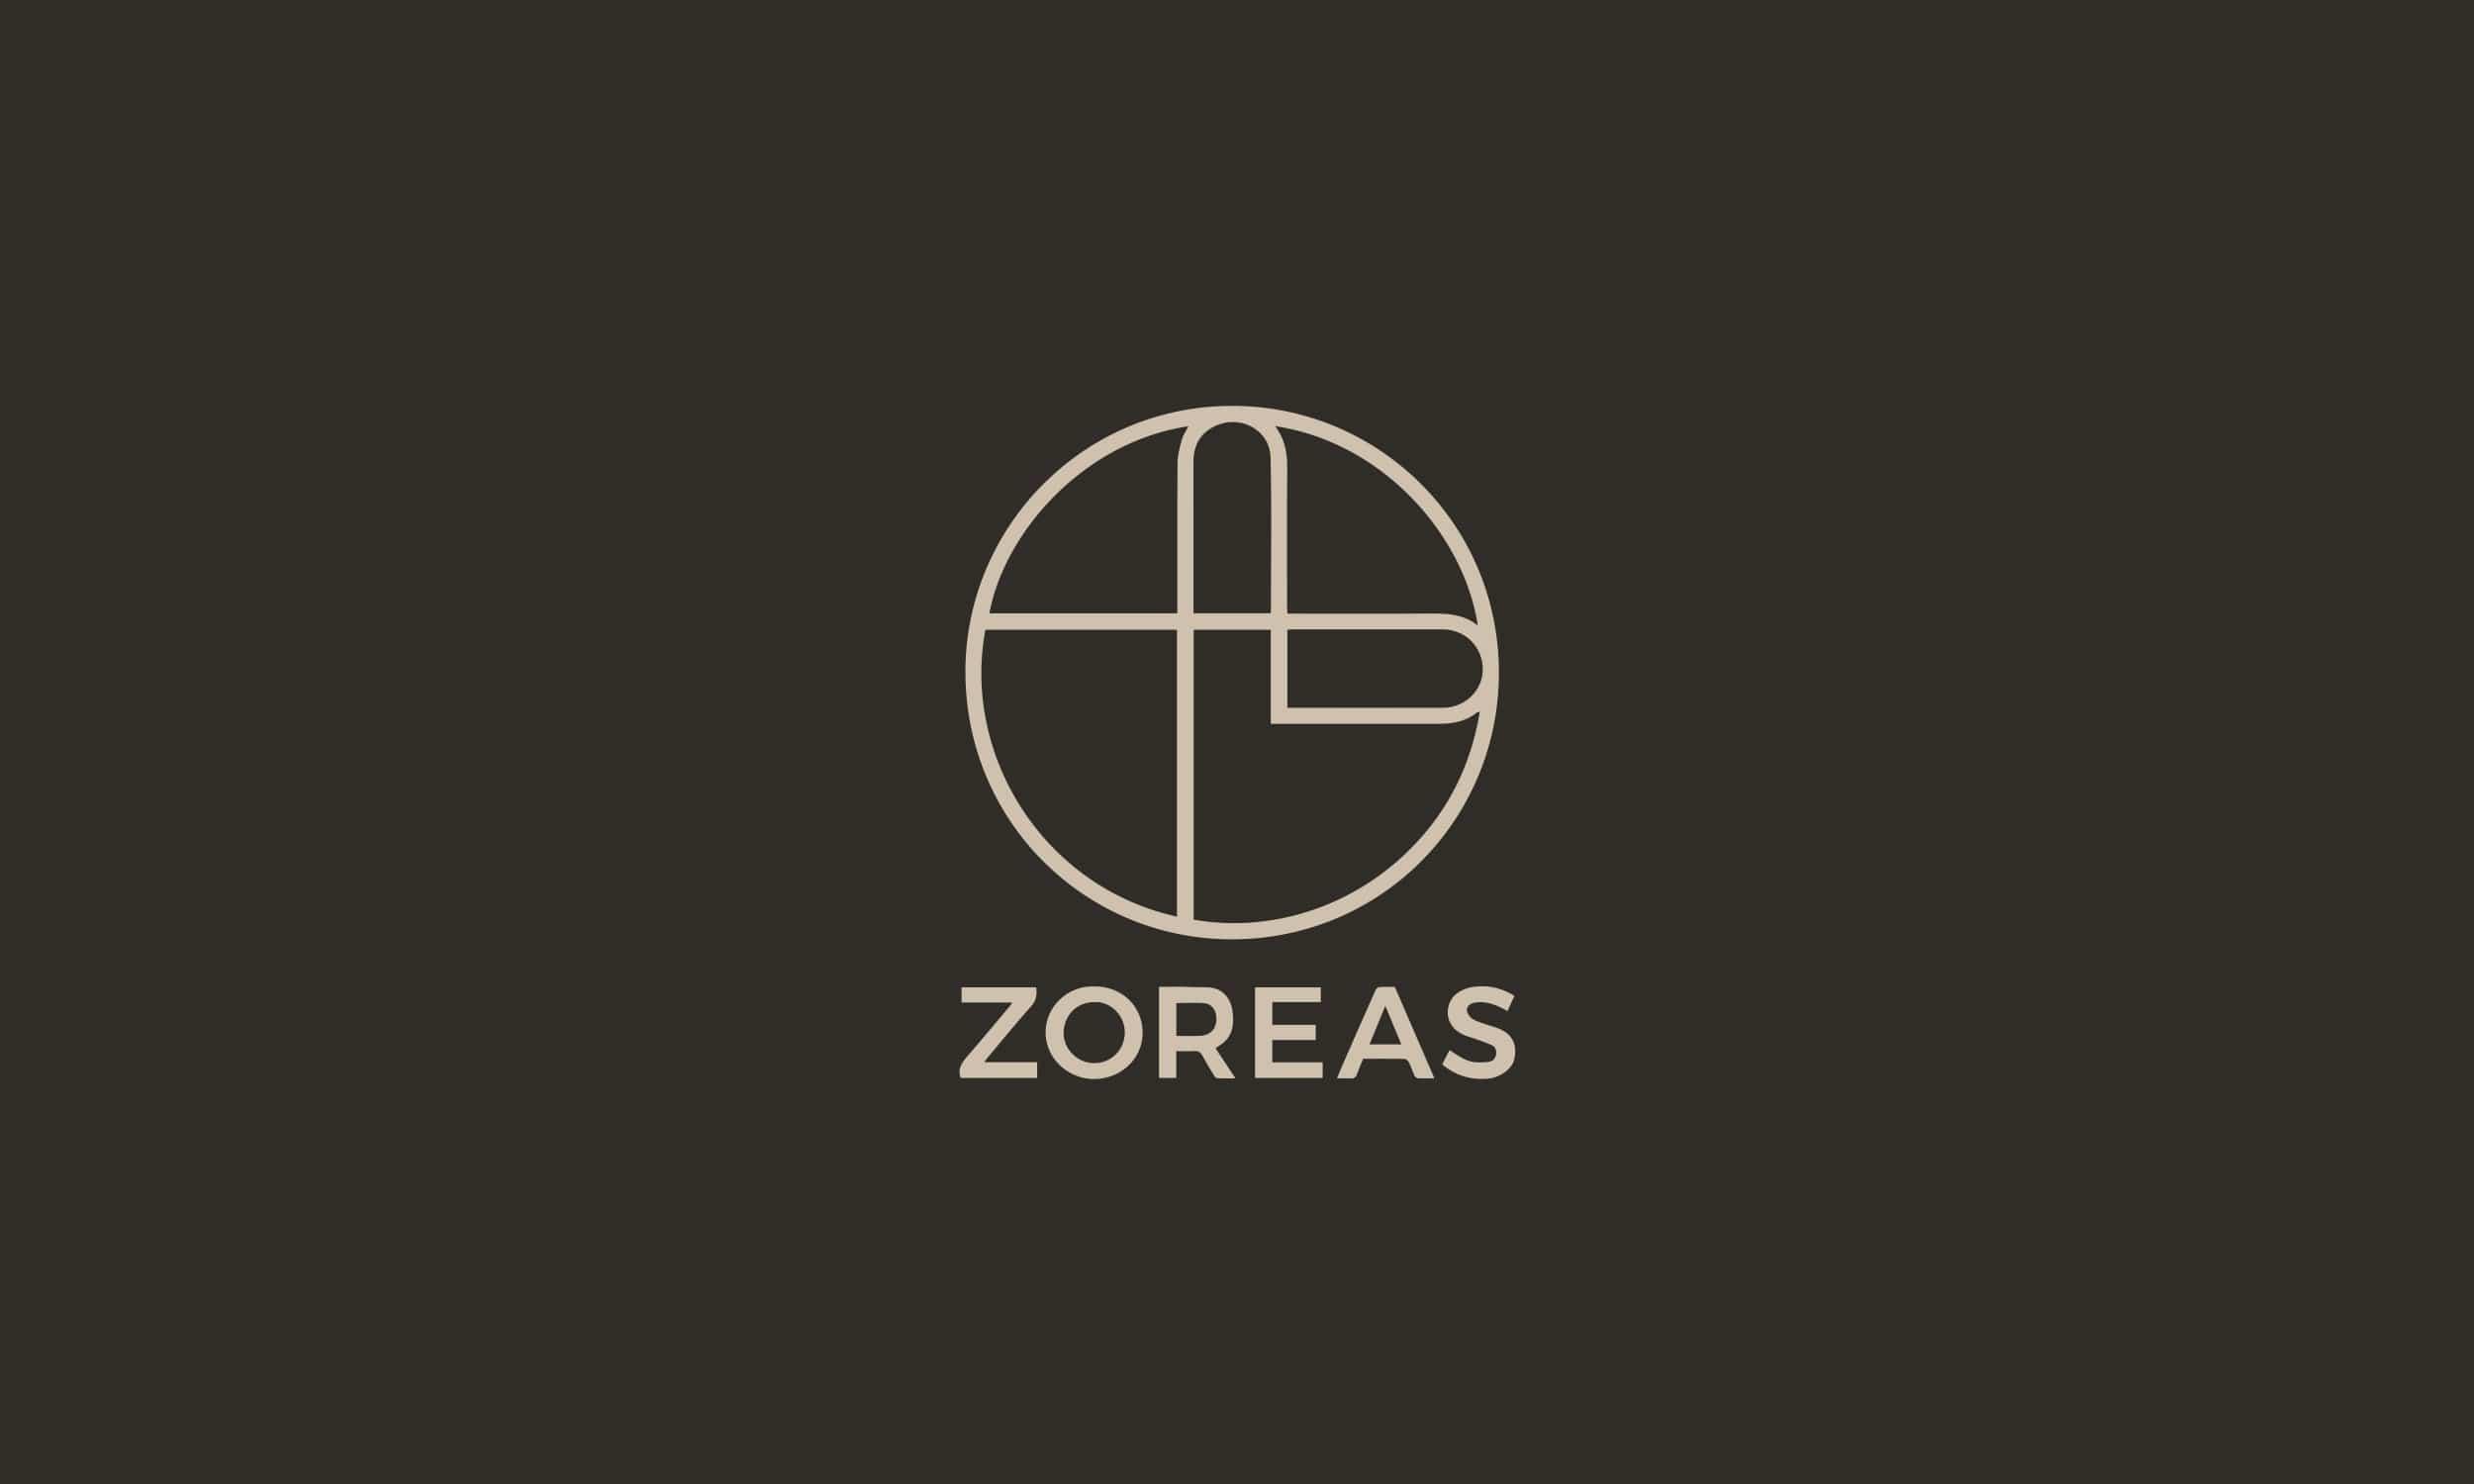 hdr-logo-template-zoreas.jpg